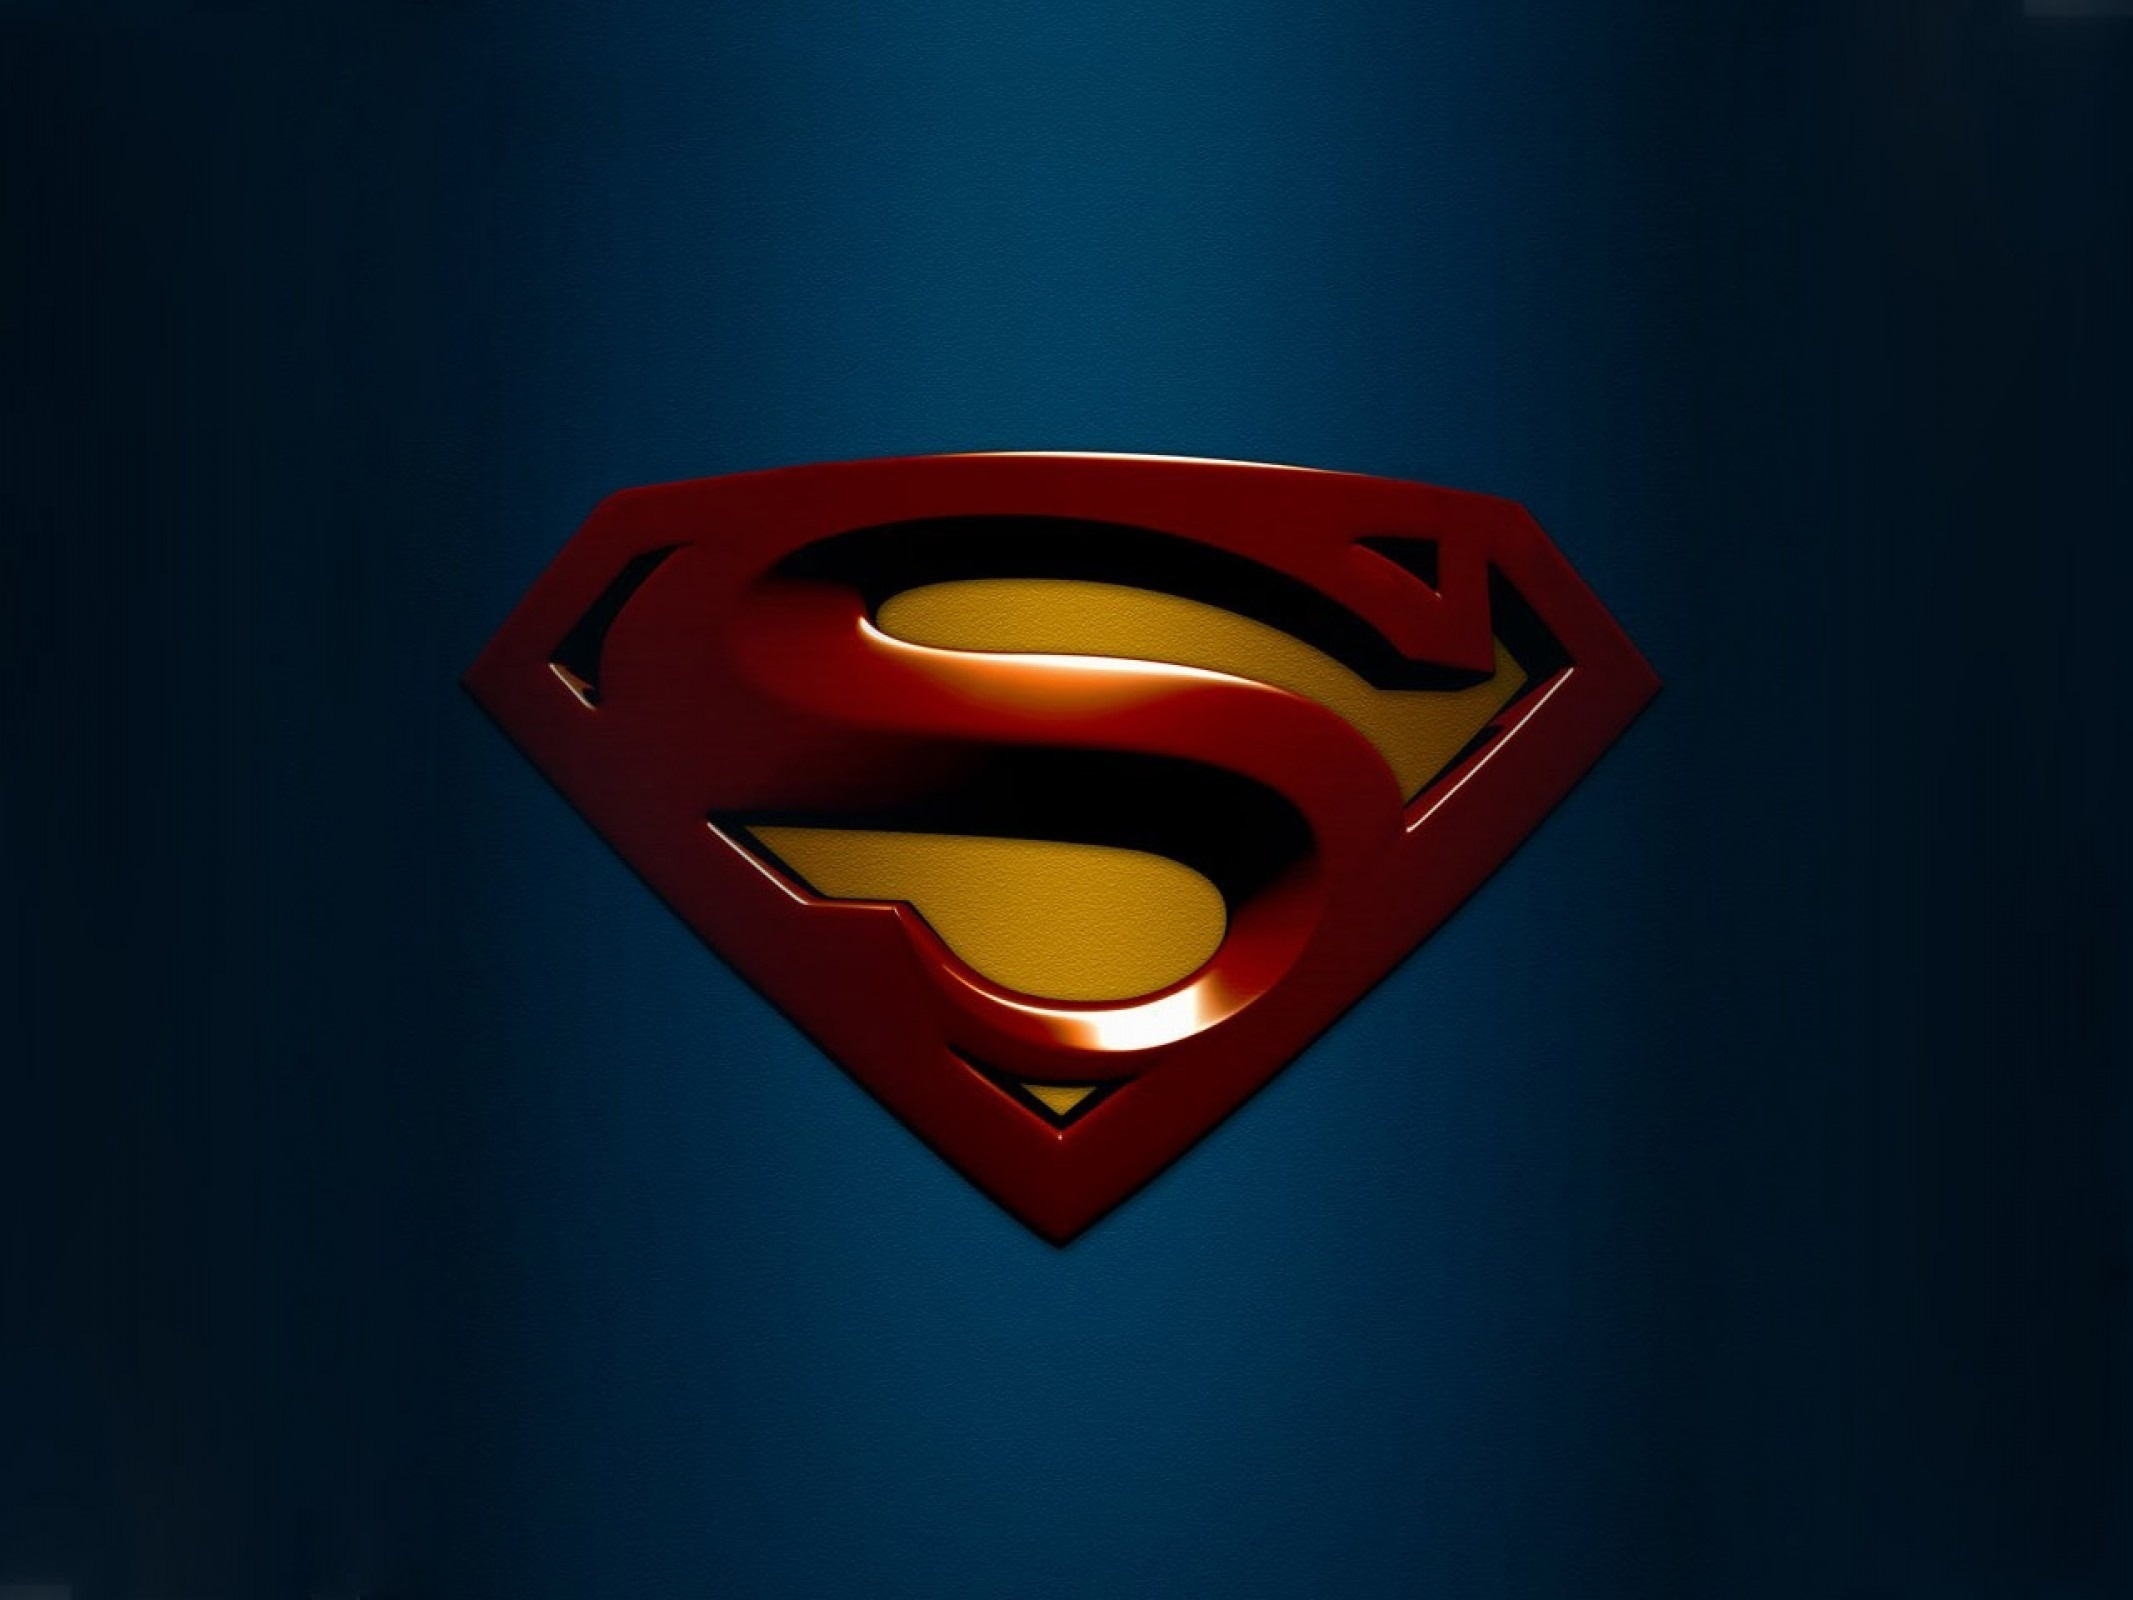 Wallpaper Superman logo graphics desktop wallpaper 3D GoodWP 2133x1600